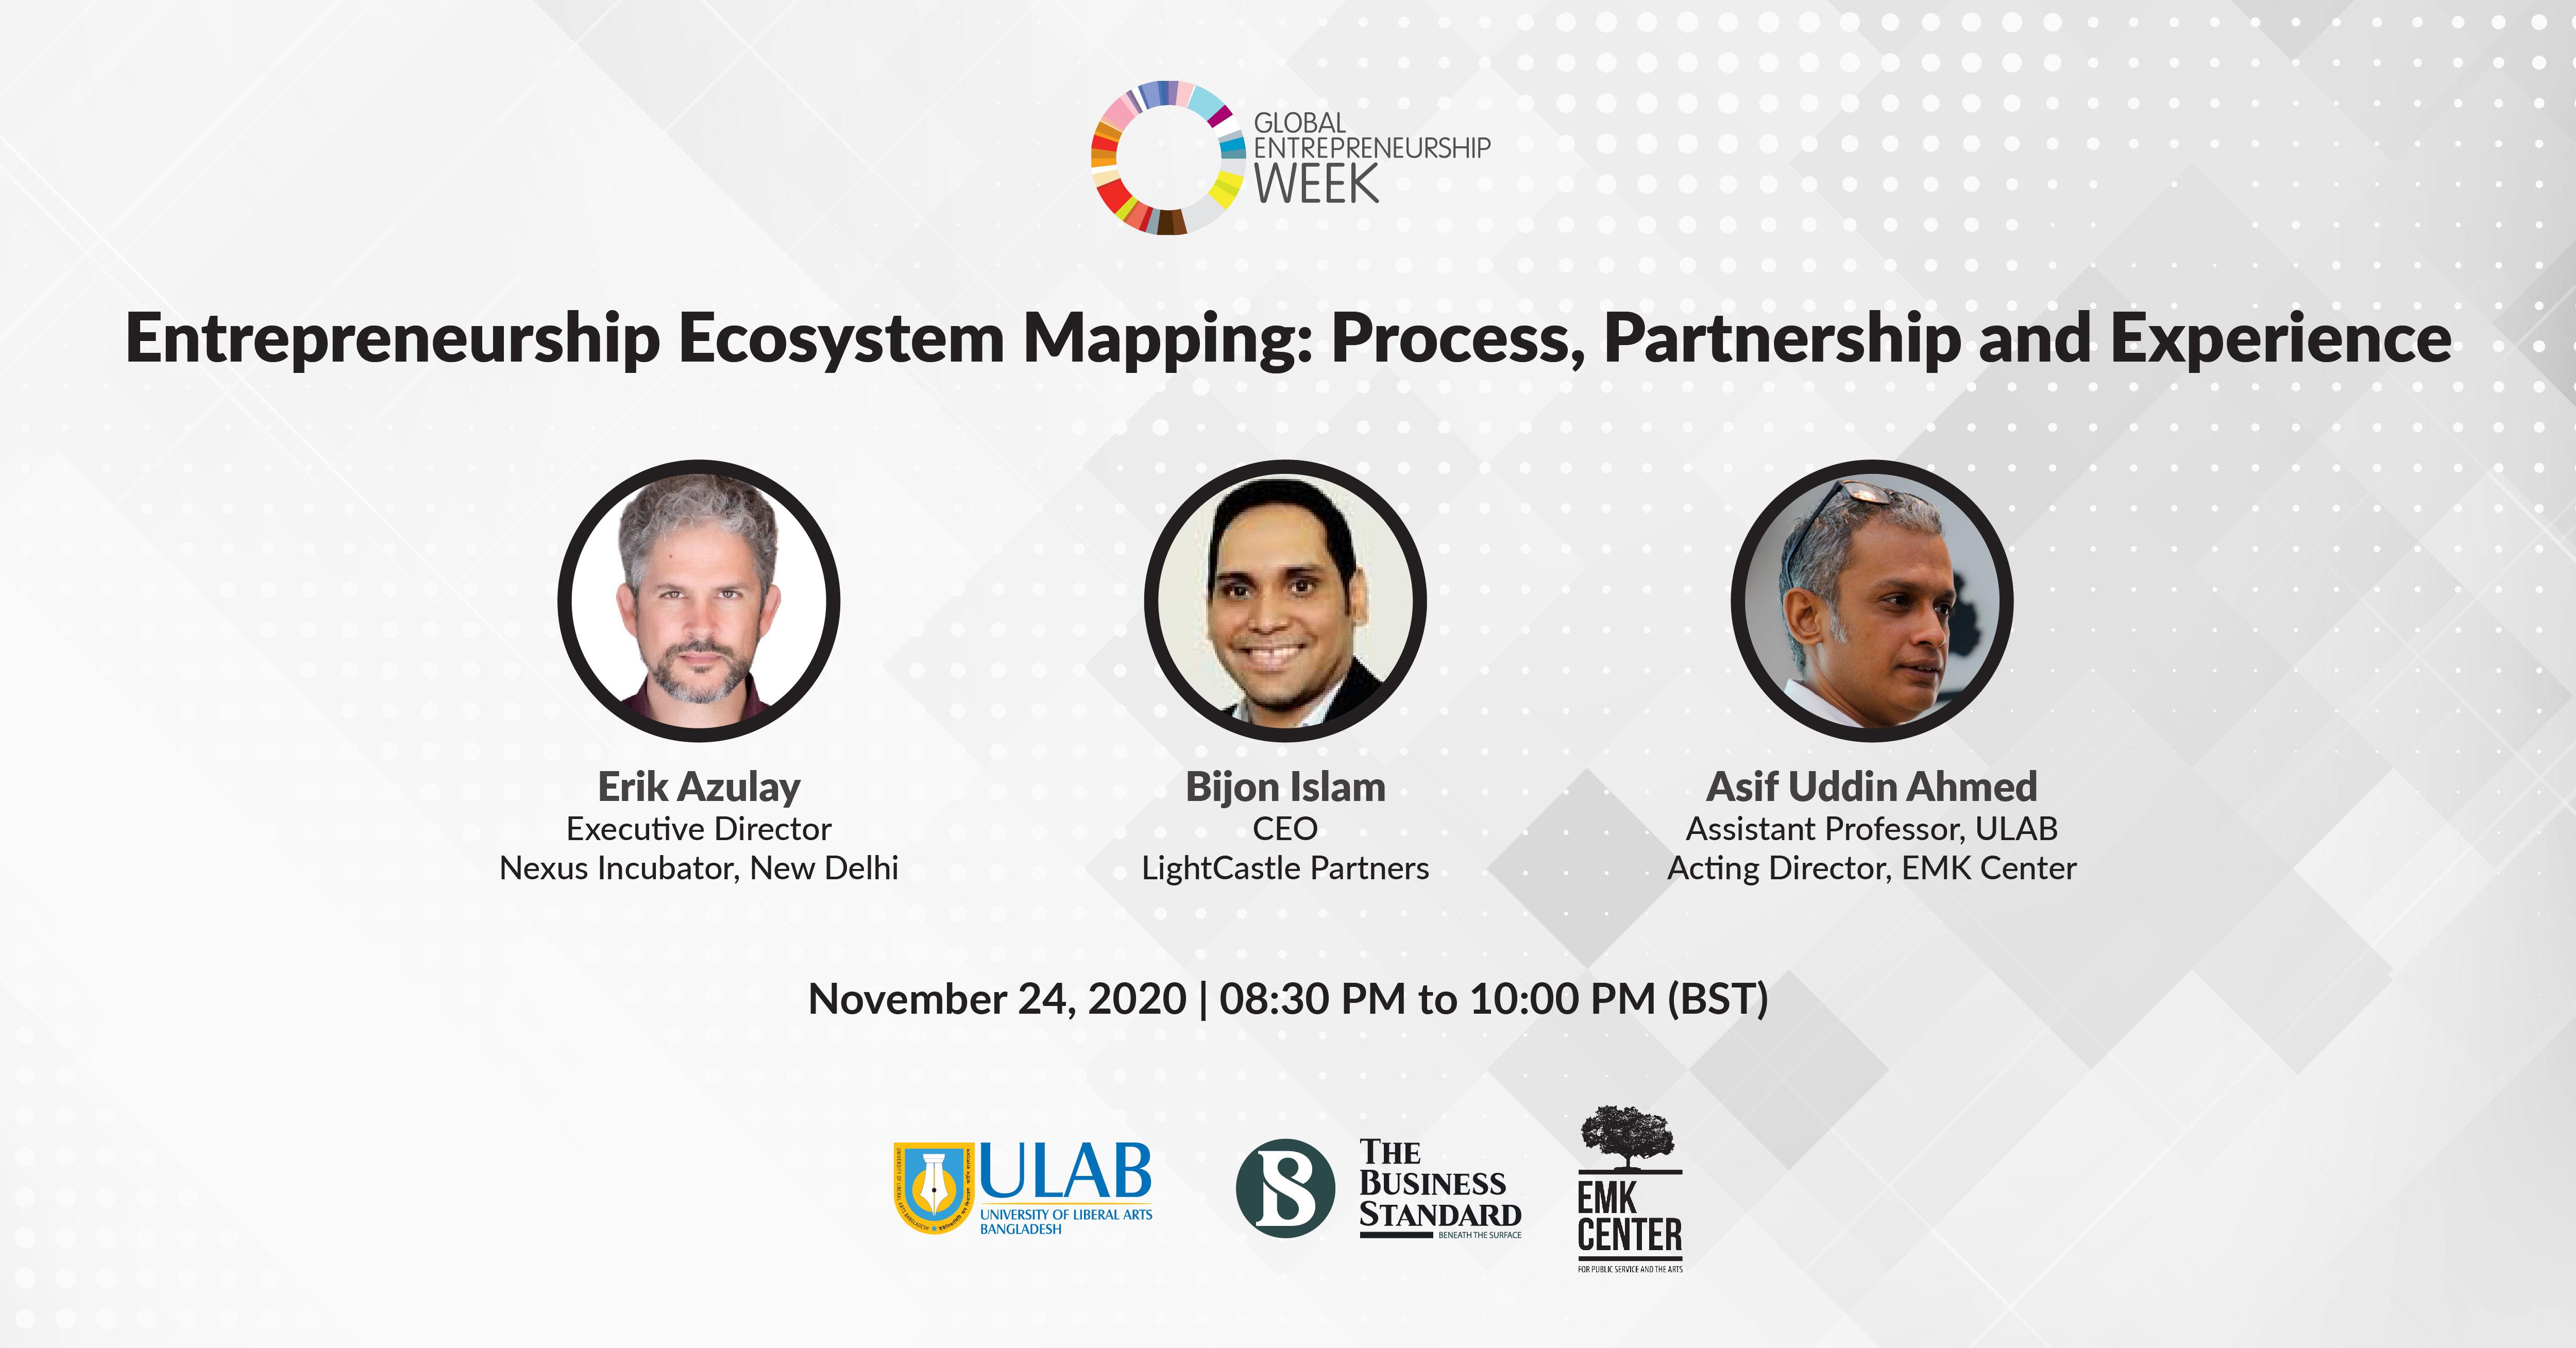 Erik Azulay, Executive Director at Nexus Incubator, New Delhi Bijon Islam, CEO of LightCastle Partners Asif U Ahmed, Assistant Professor at ULAB & Acting Director of EMK Center.